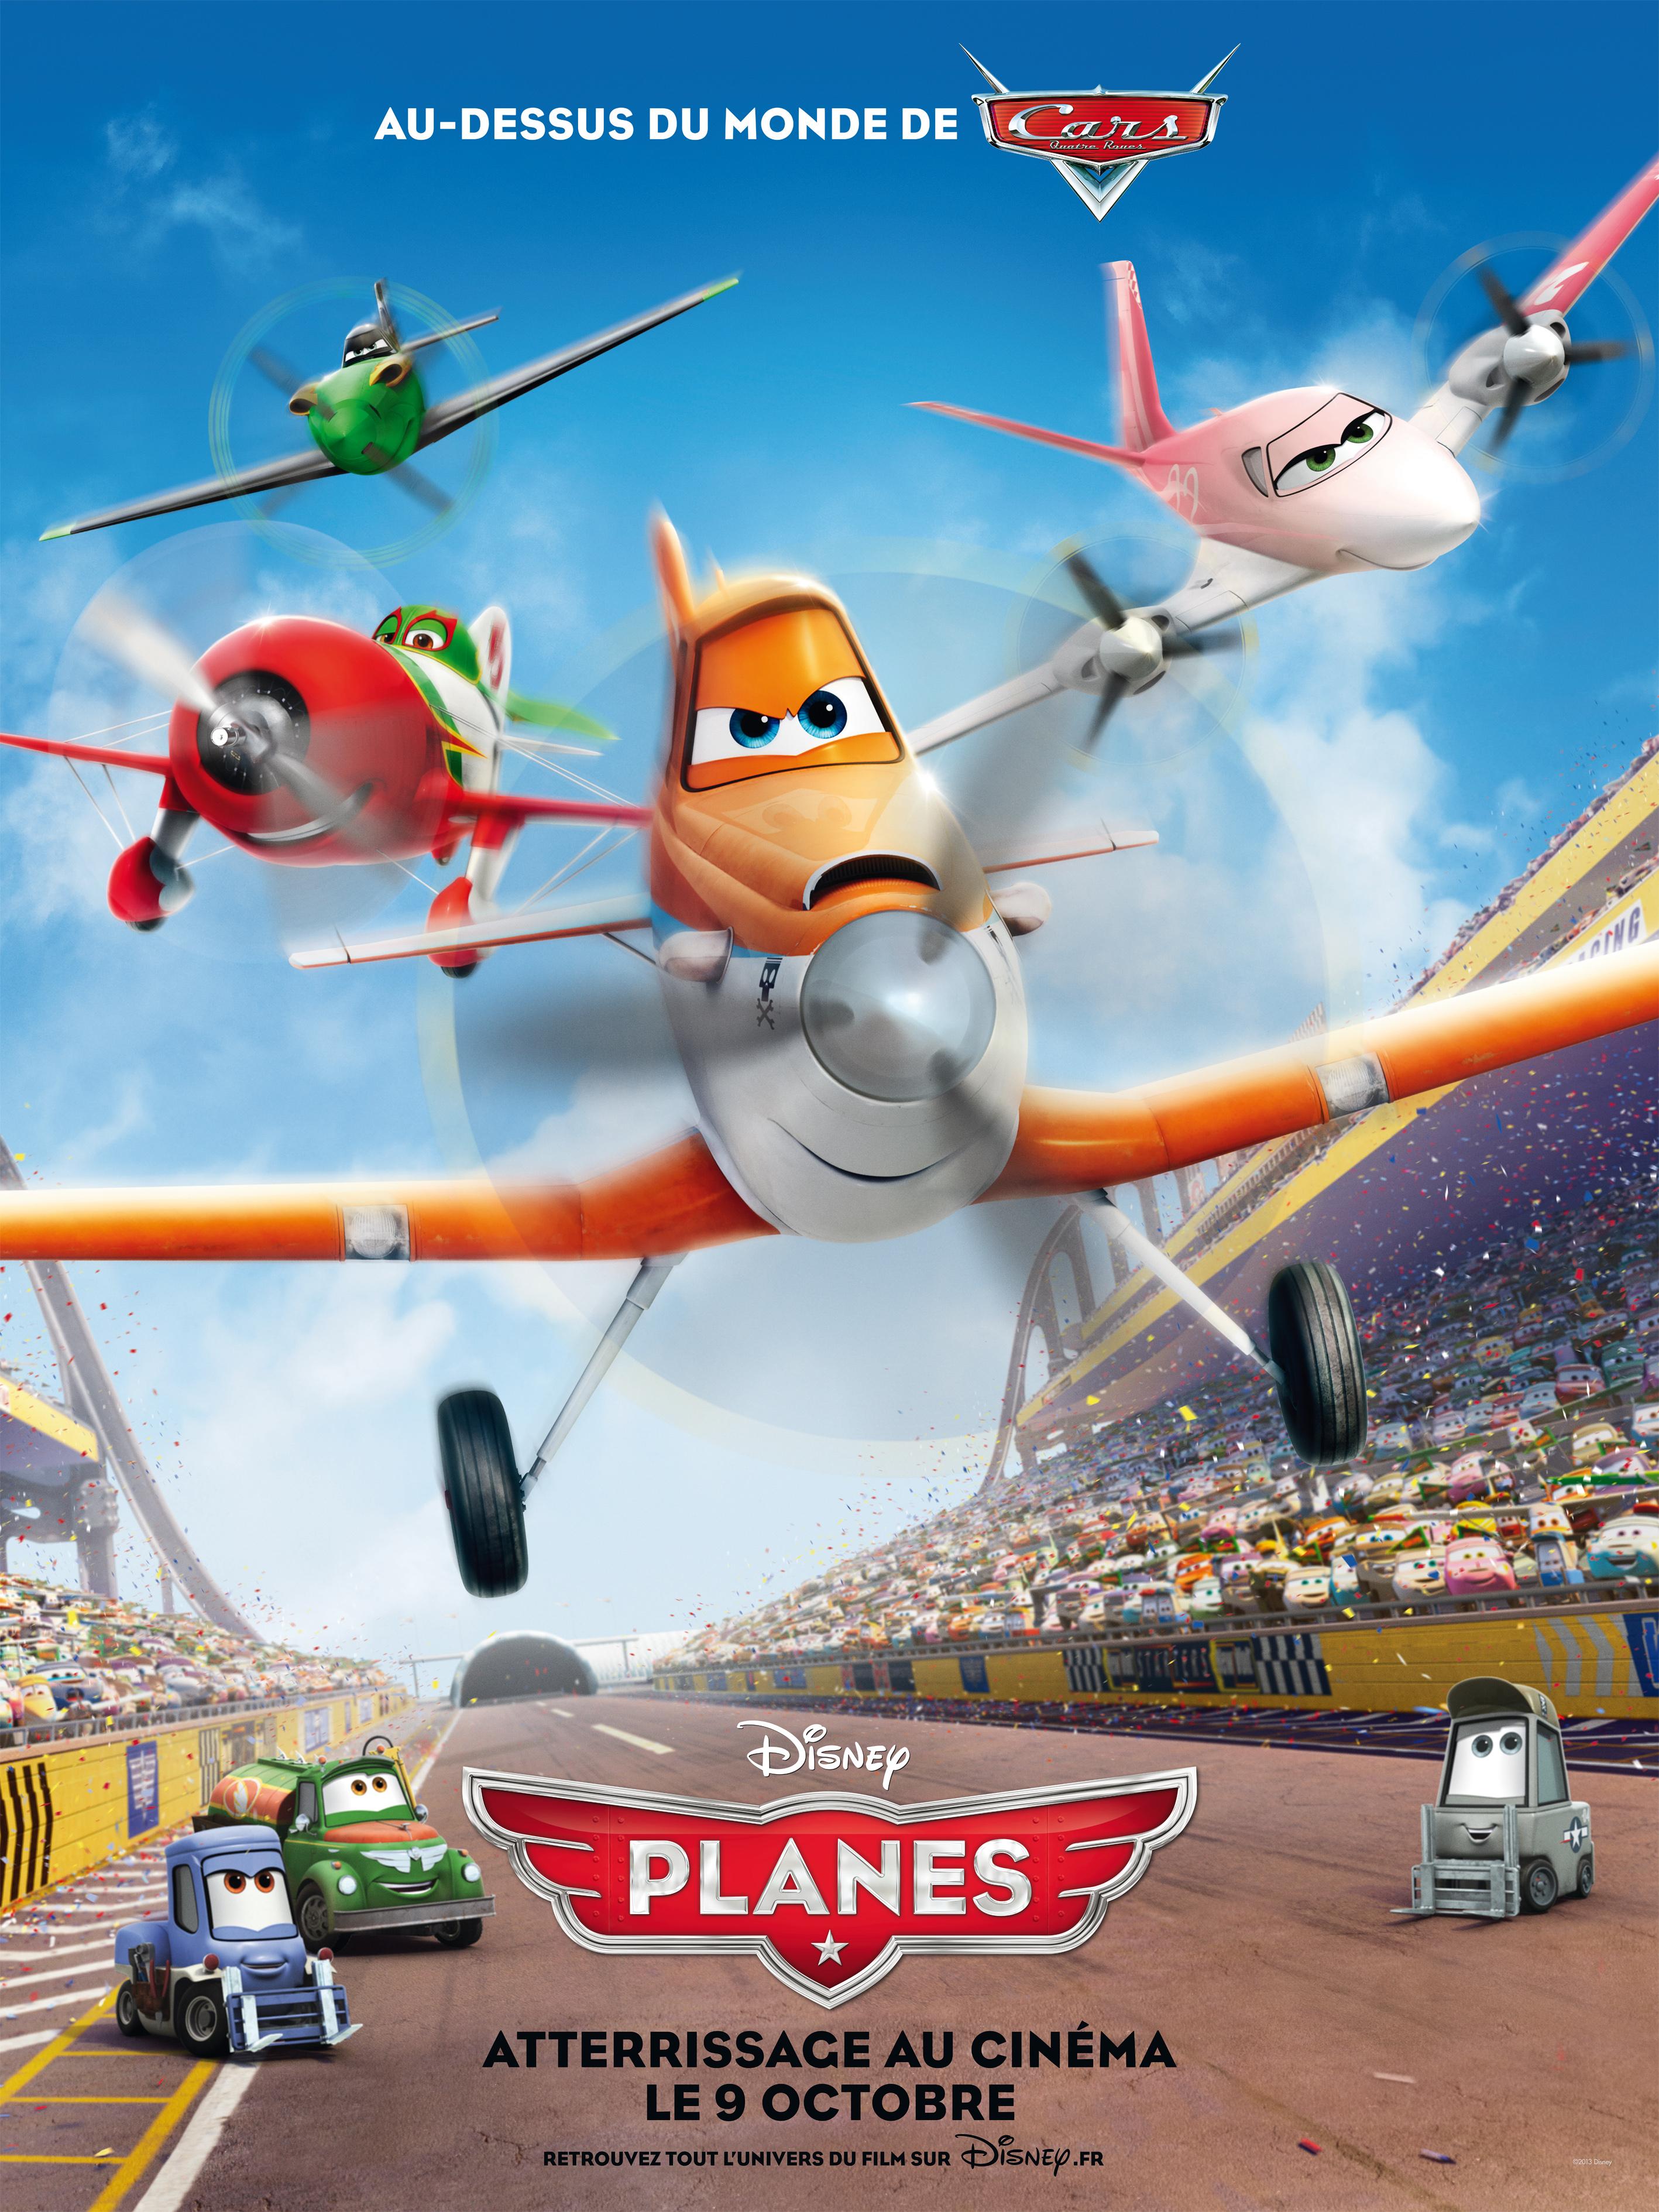 Planes-disney-affiche